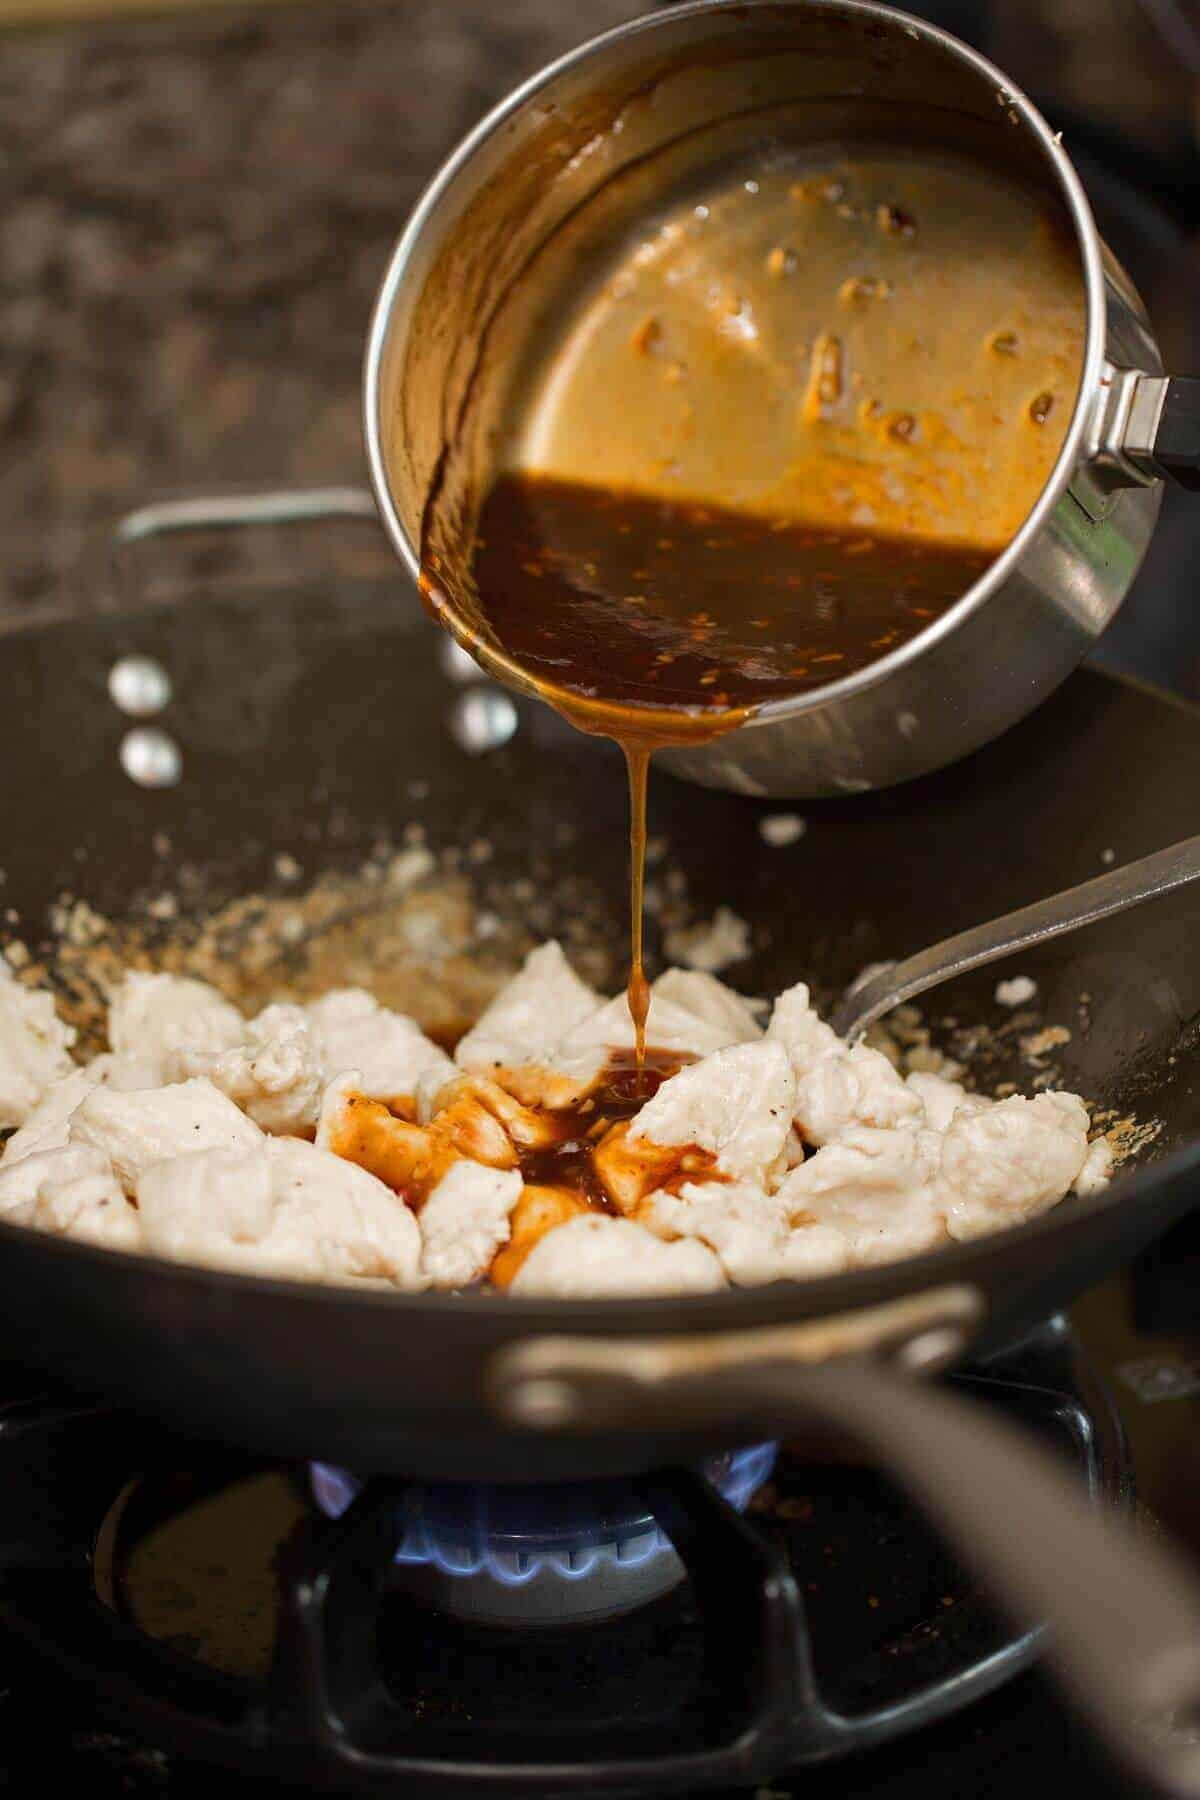 Sriracha sauce mixed with stir-fry chicken recipe